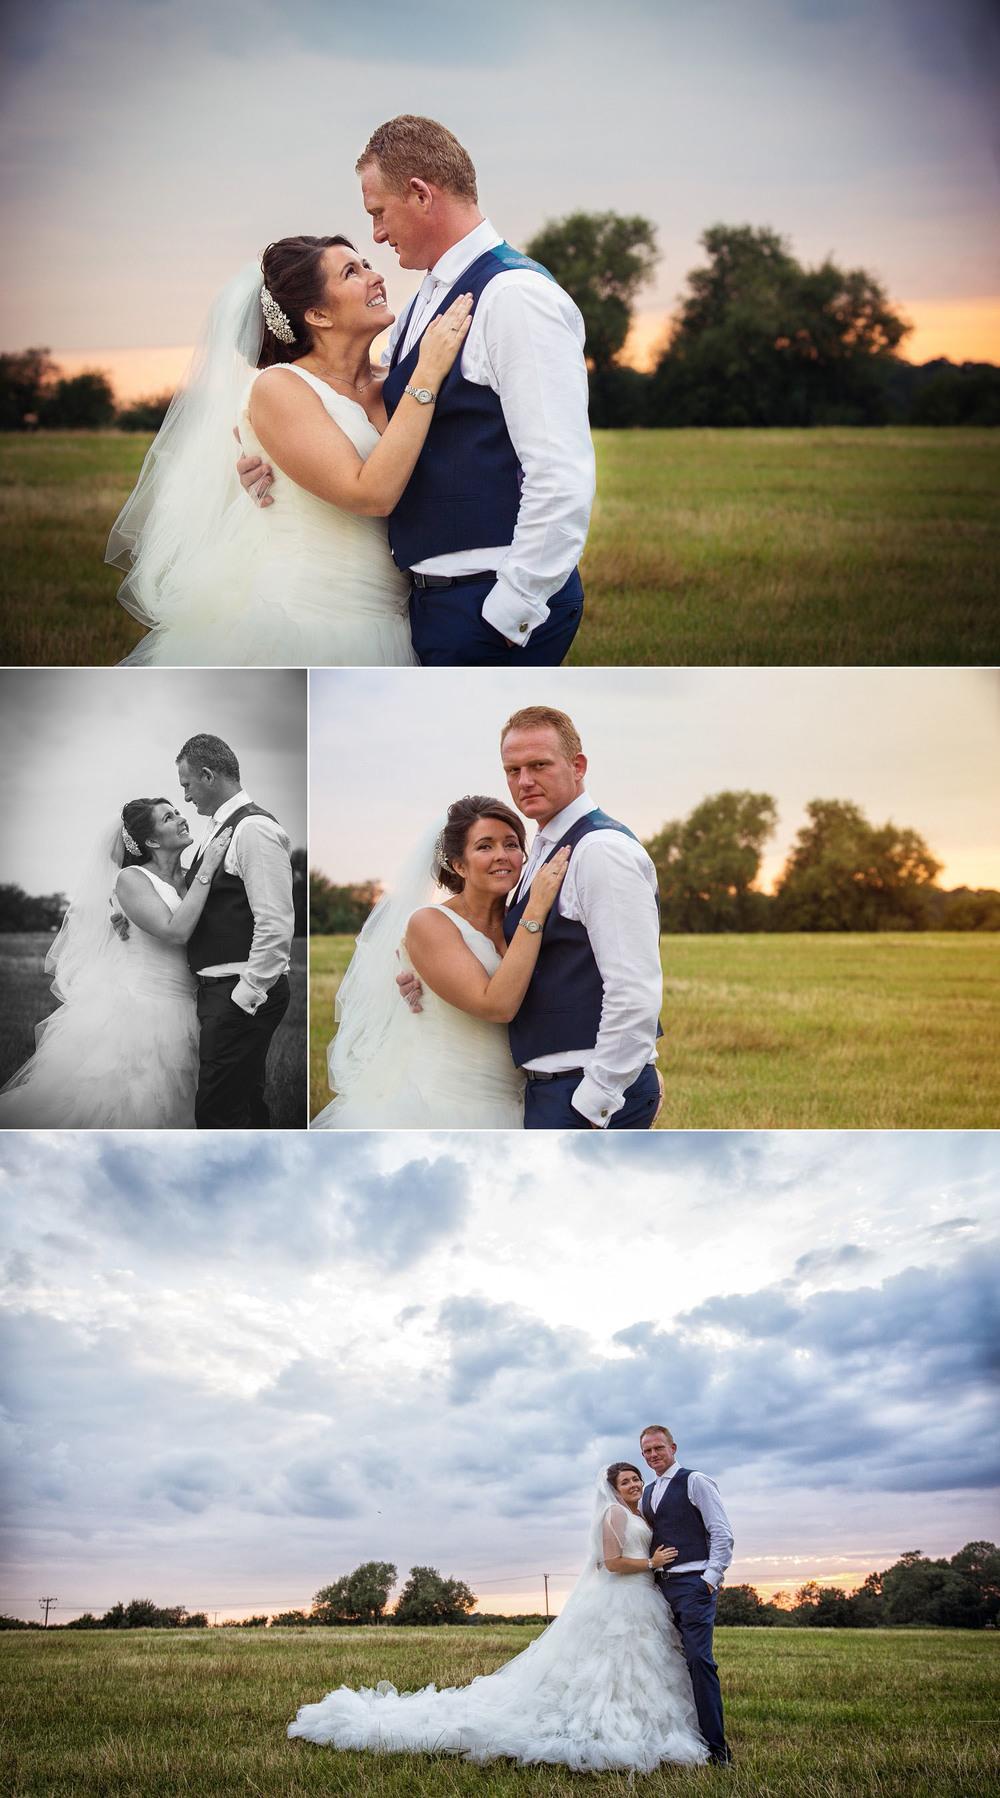 Old Brook Barn Essex Wedding by Anesta Broad_0158.jpg